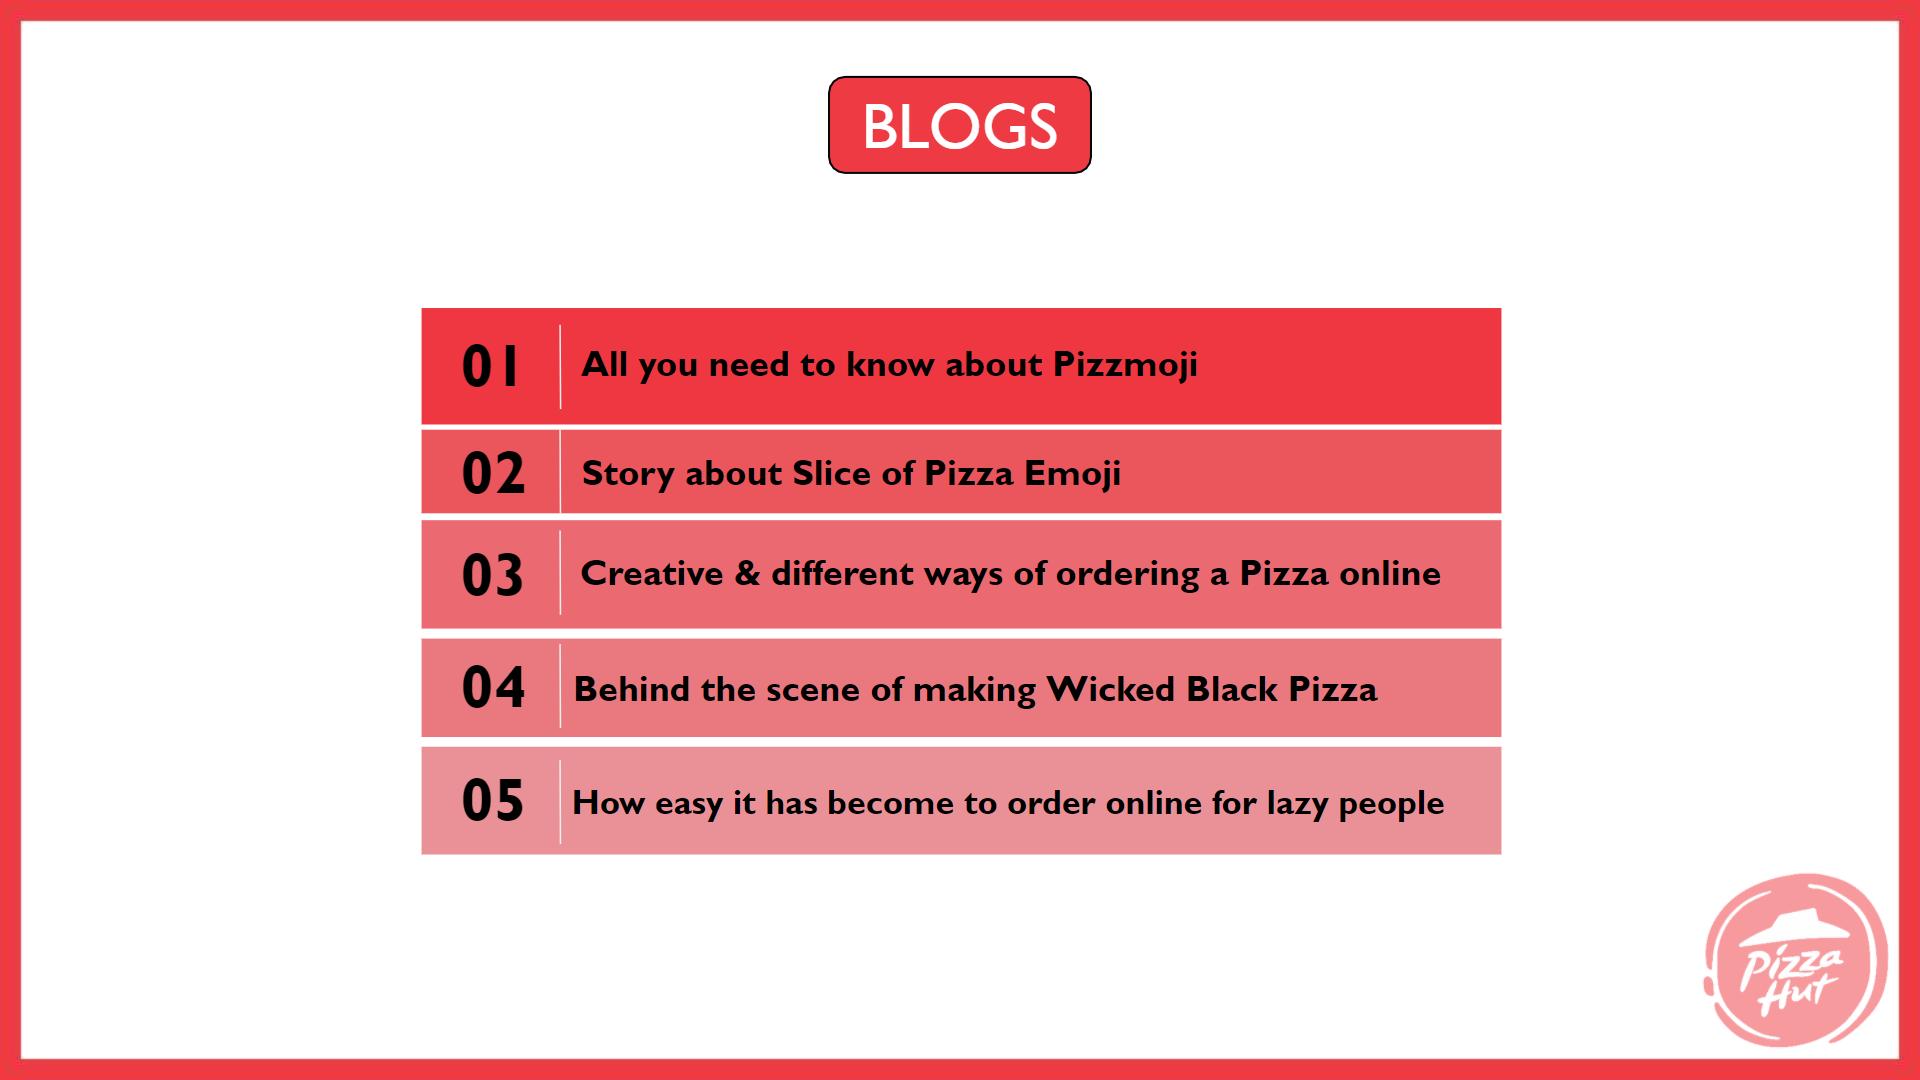 pizza hut marketing strategy Blog Strategy - Pizza Hut Marketing and Advertising Strategy